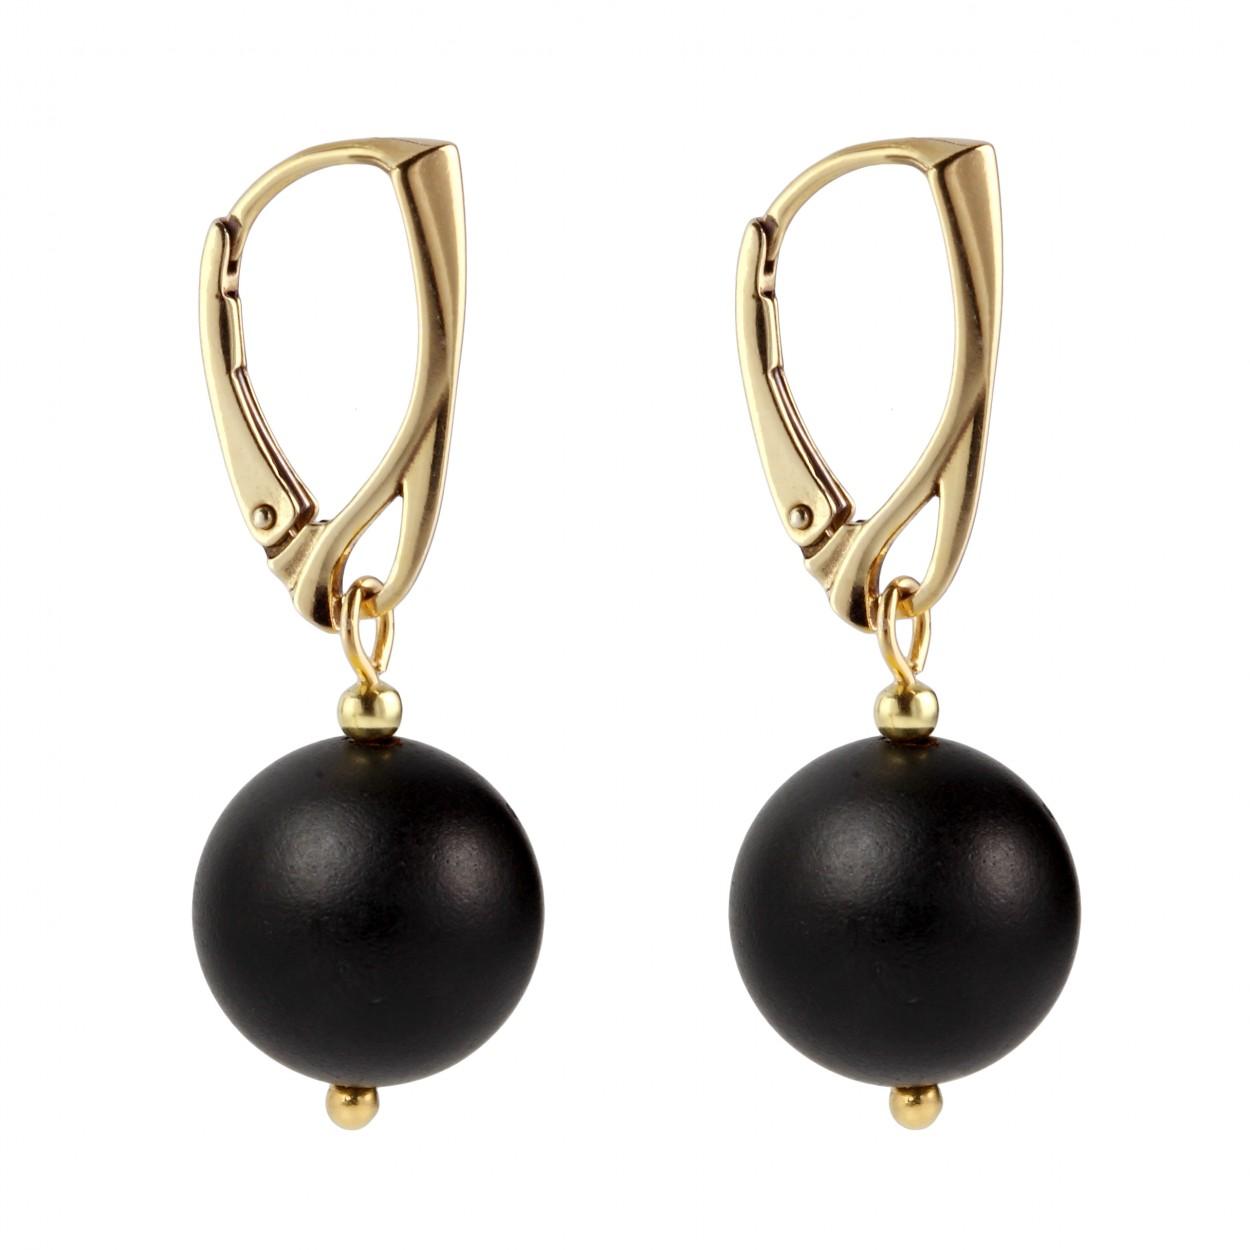 Rustic Balls Amber Earrings